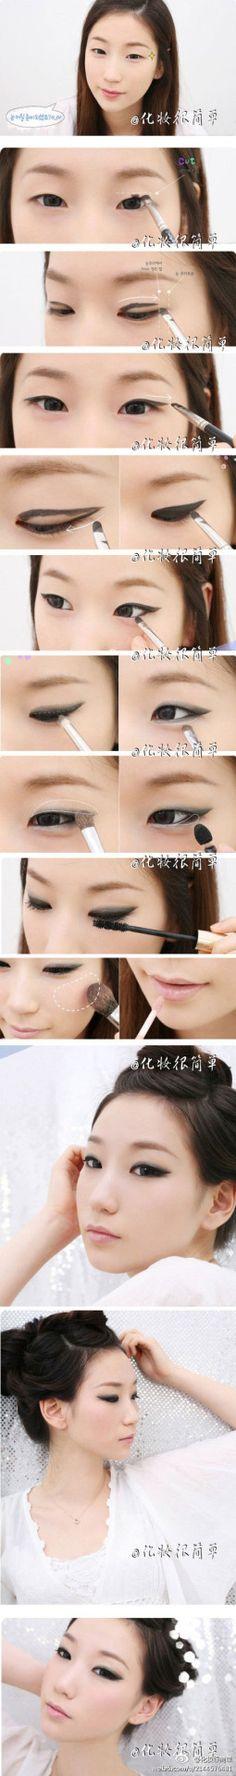 Blog about Korea, Japan, kpop, ulzzang, gyaru, DIY, cosmetics and beauty ^.^